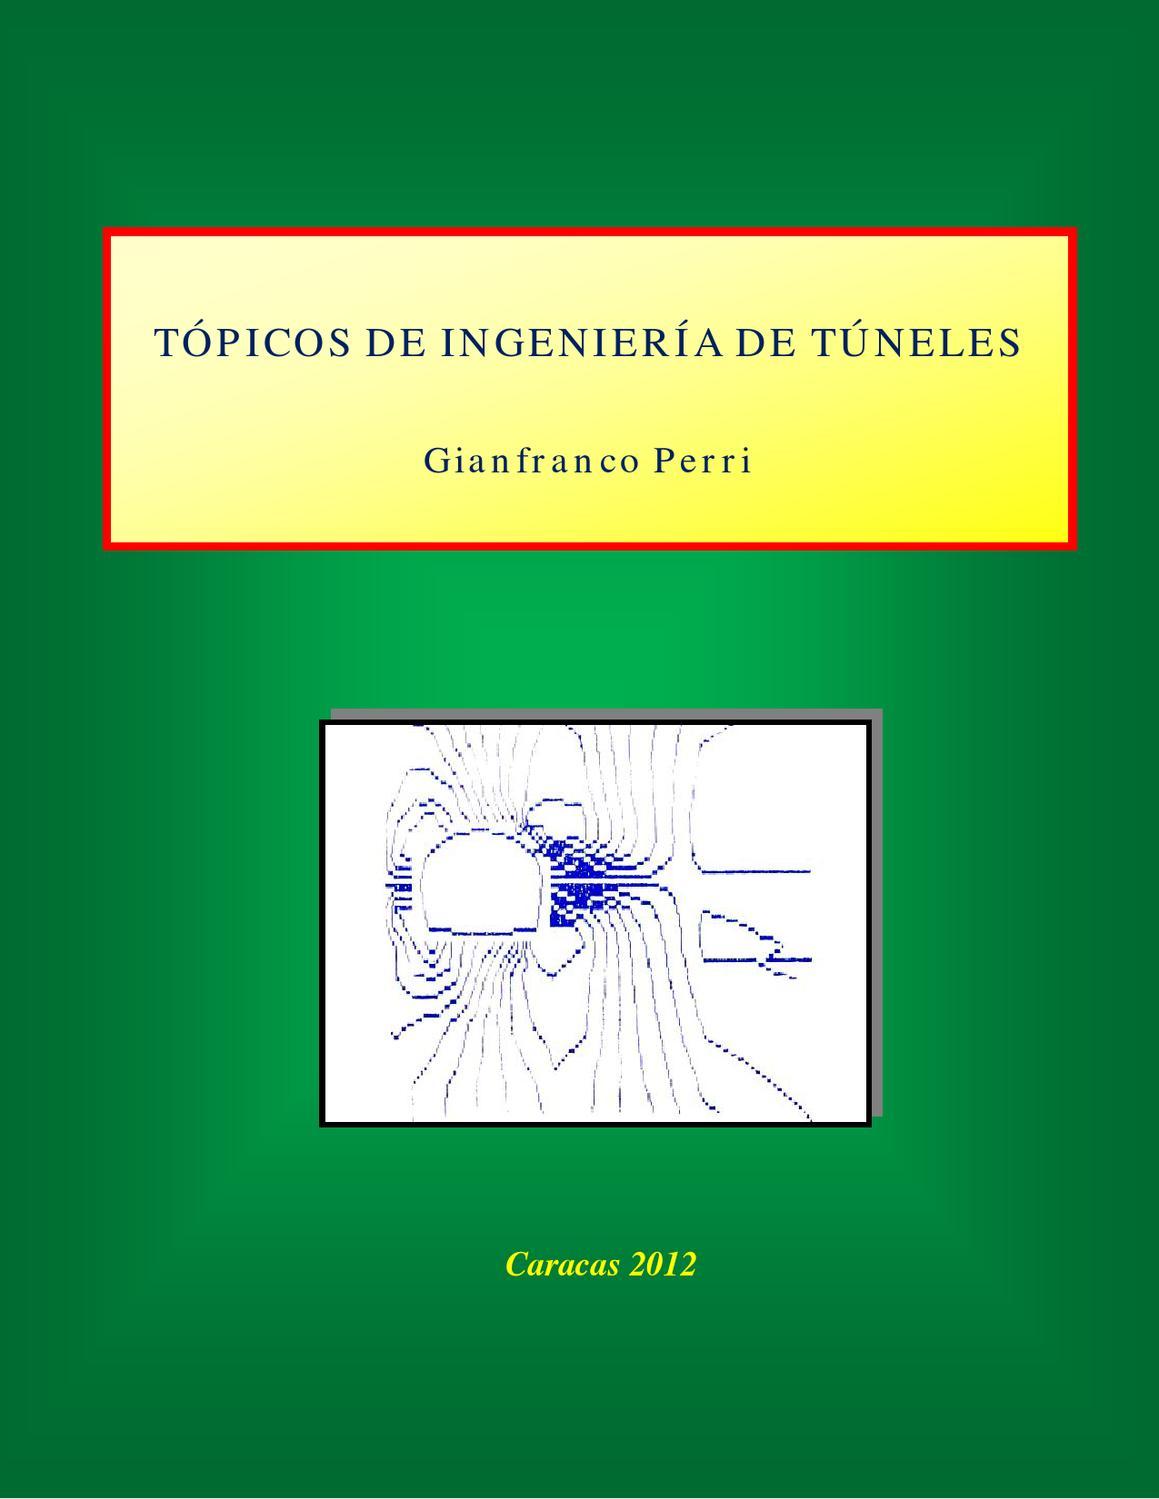 topicos de ingenieria de tuneles by Javier C Salgado - issuu